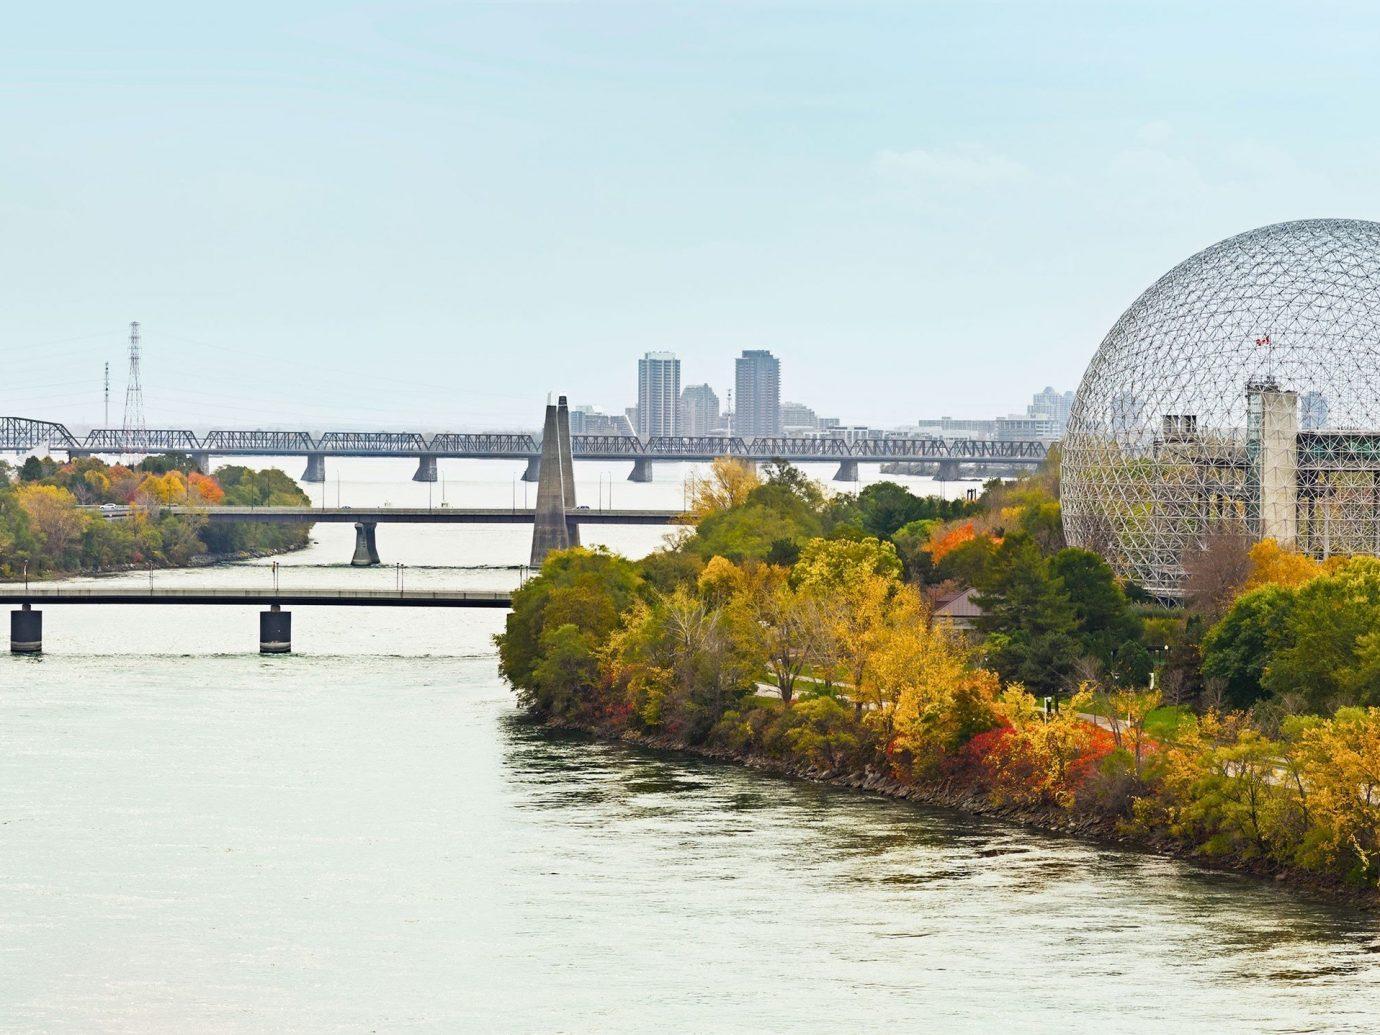 Trip Ideas sky outdoor water River landmark bridge cityscape tourism waterway reflection skyline traveling day